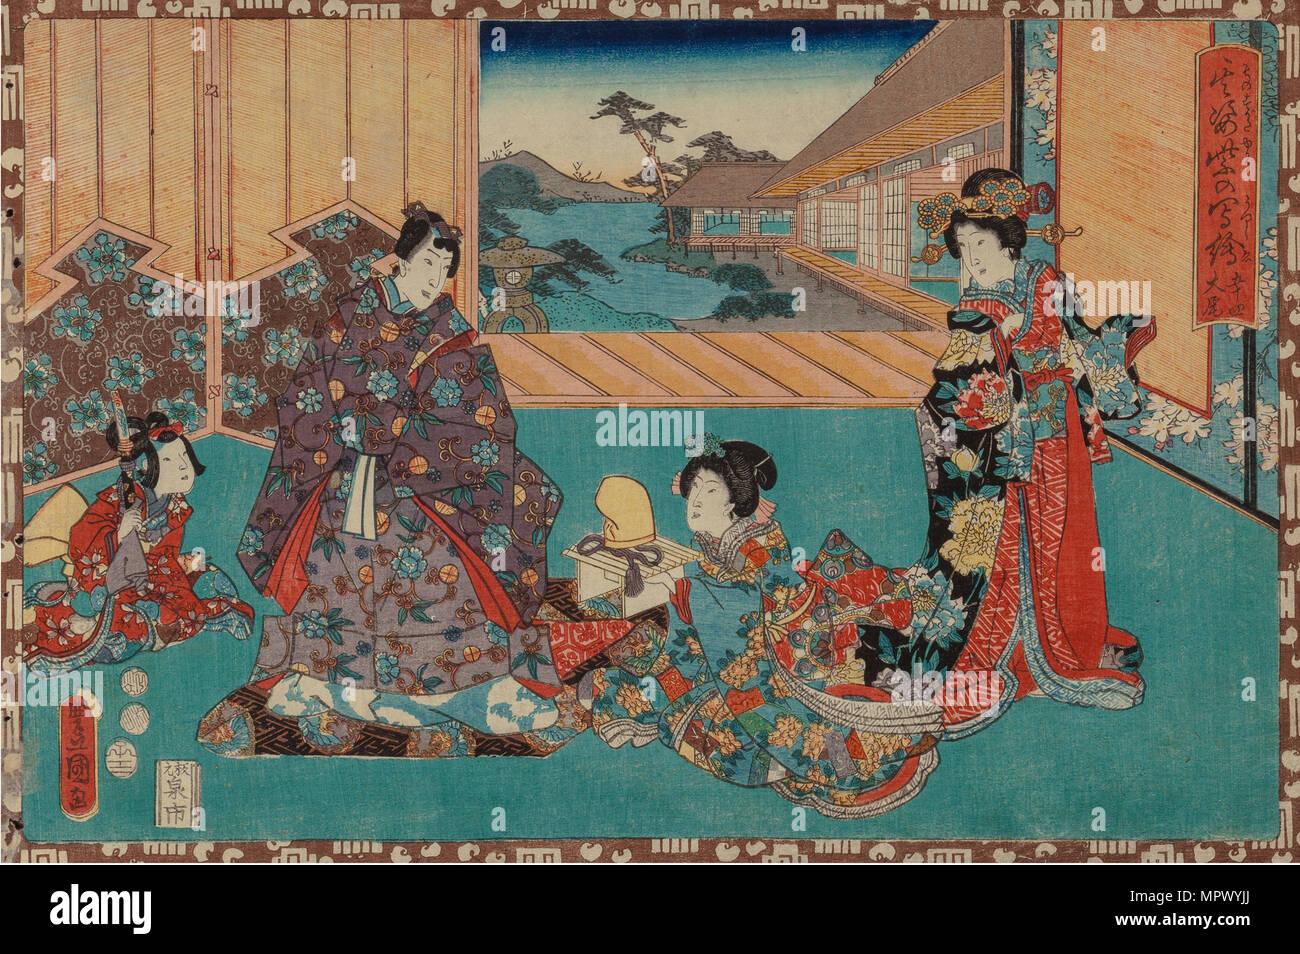 From the series Sono sugata yukari no utsushi-e (Magic Lantern Slides of That Romantic Purple Figure - Stock Image